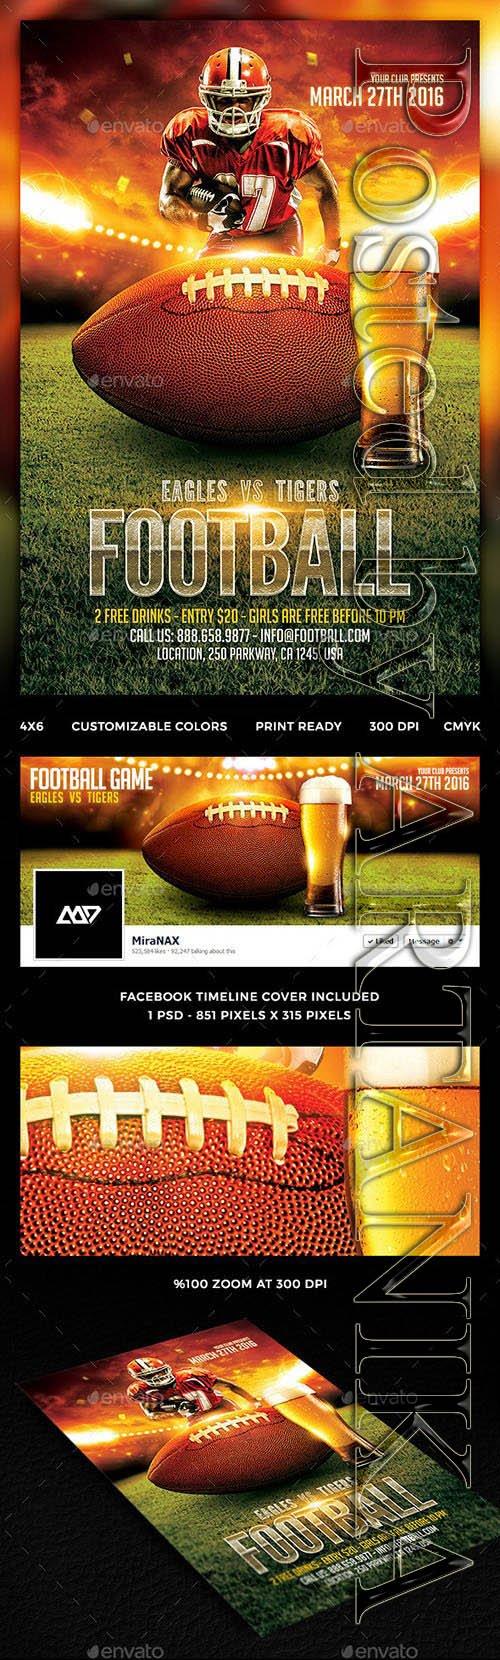 Football Game Flyer Template PSD 12294551